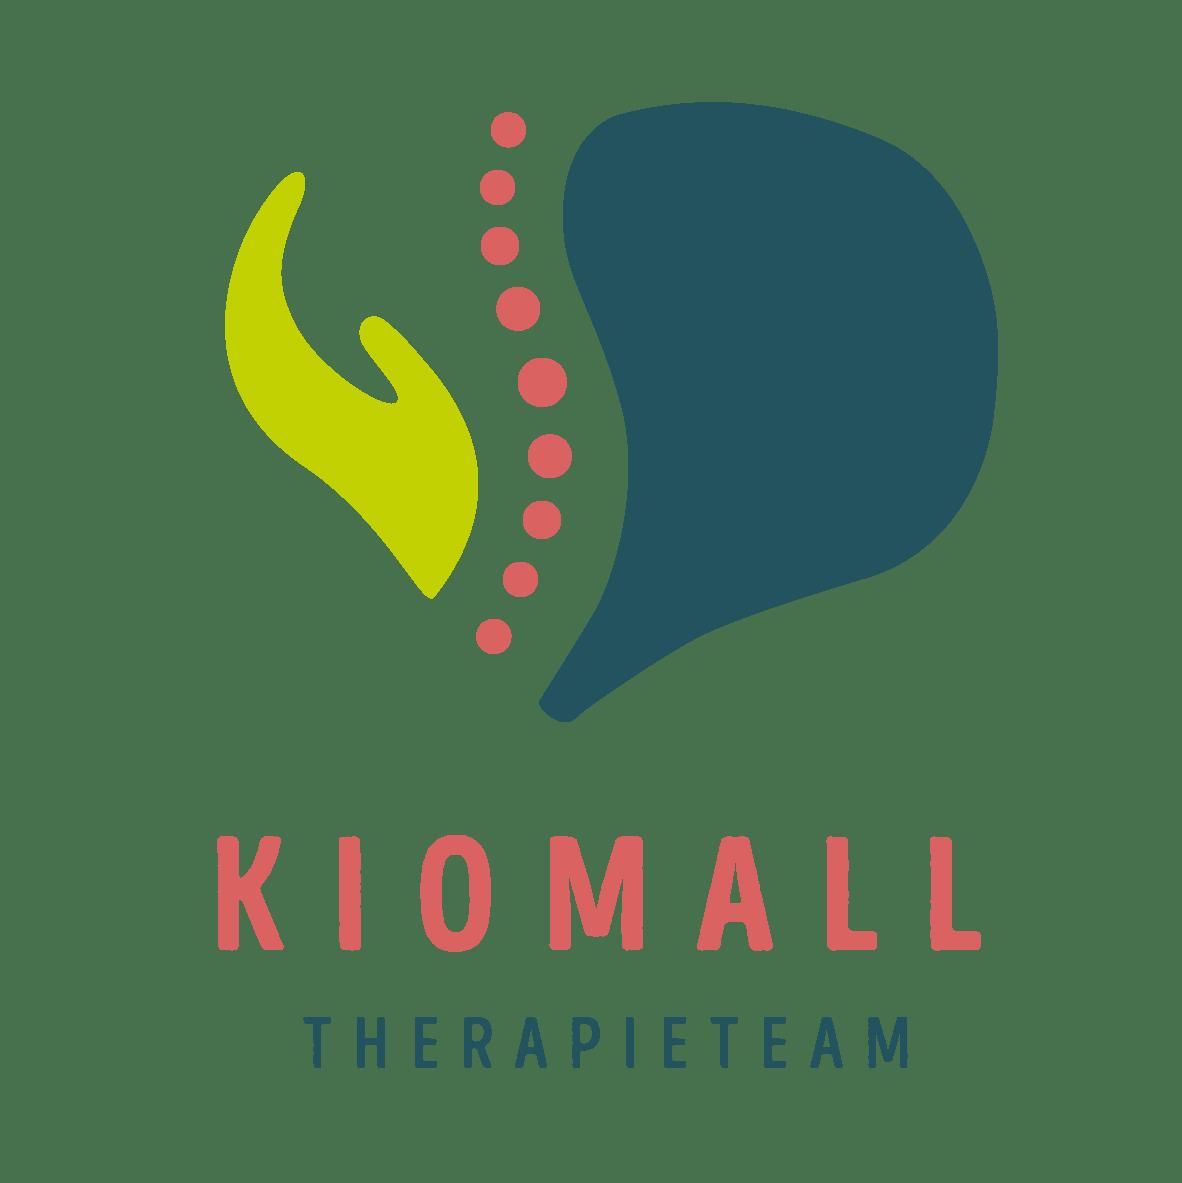 Therapieteam Kiomall